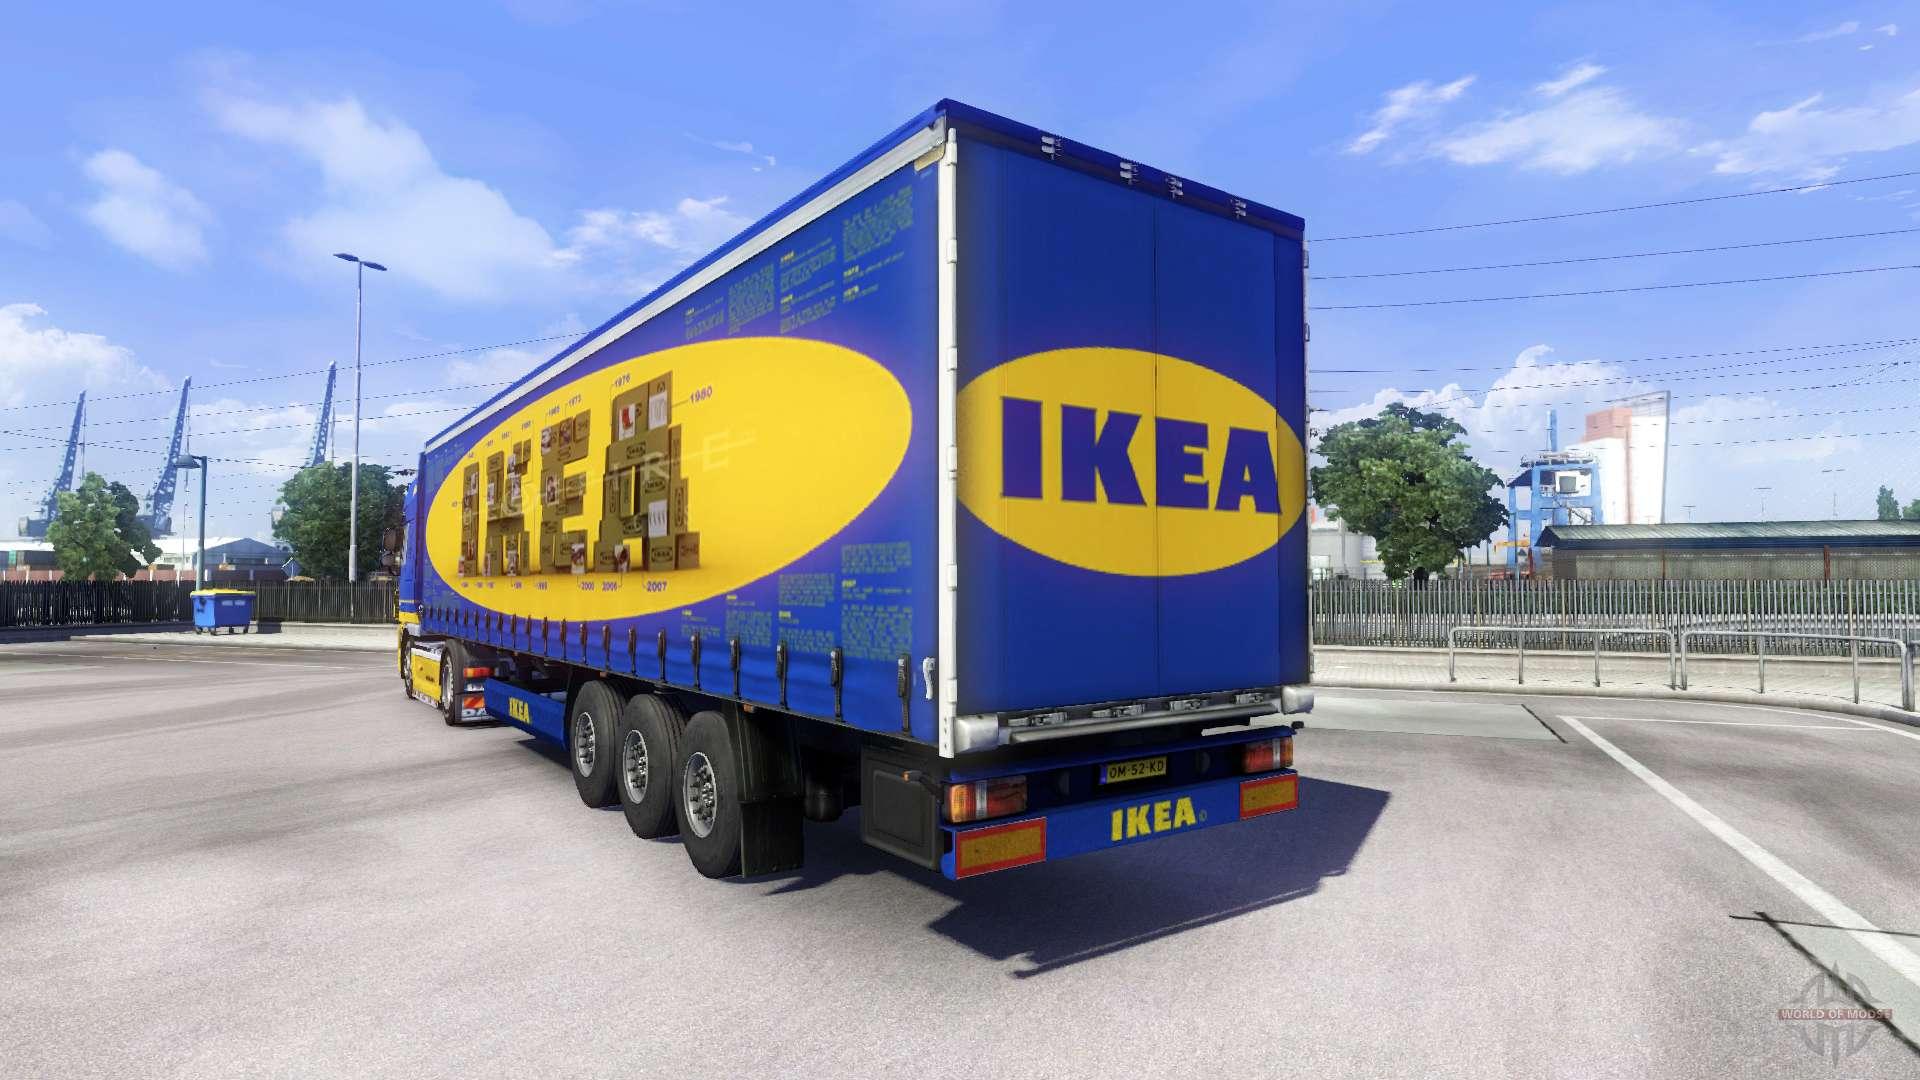 Skin ikea for daf xf tractor unit for euro truck simulator 2 Ikea simulation